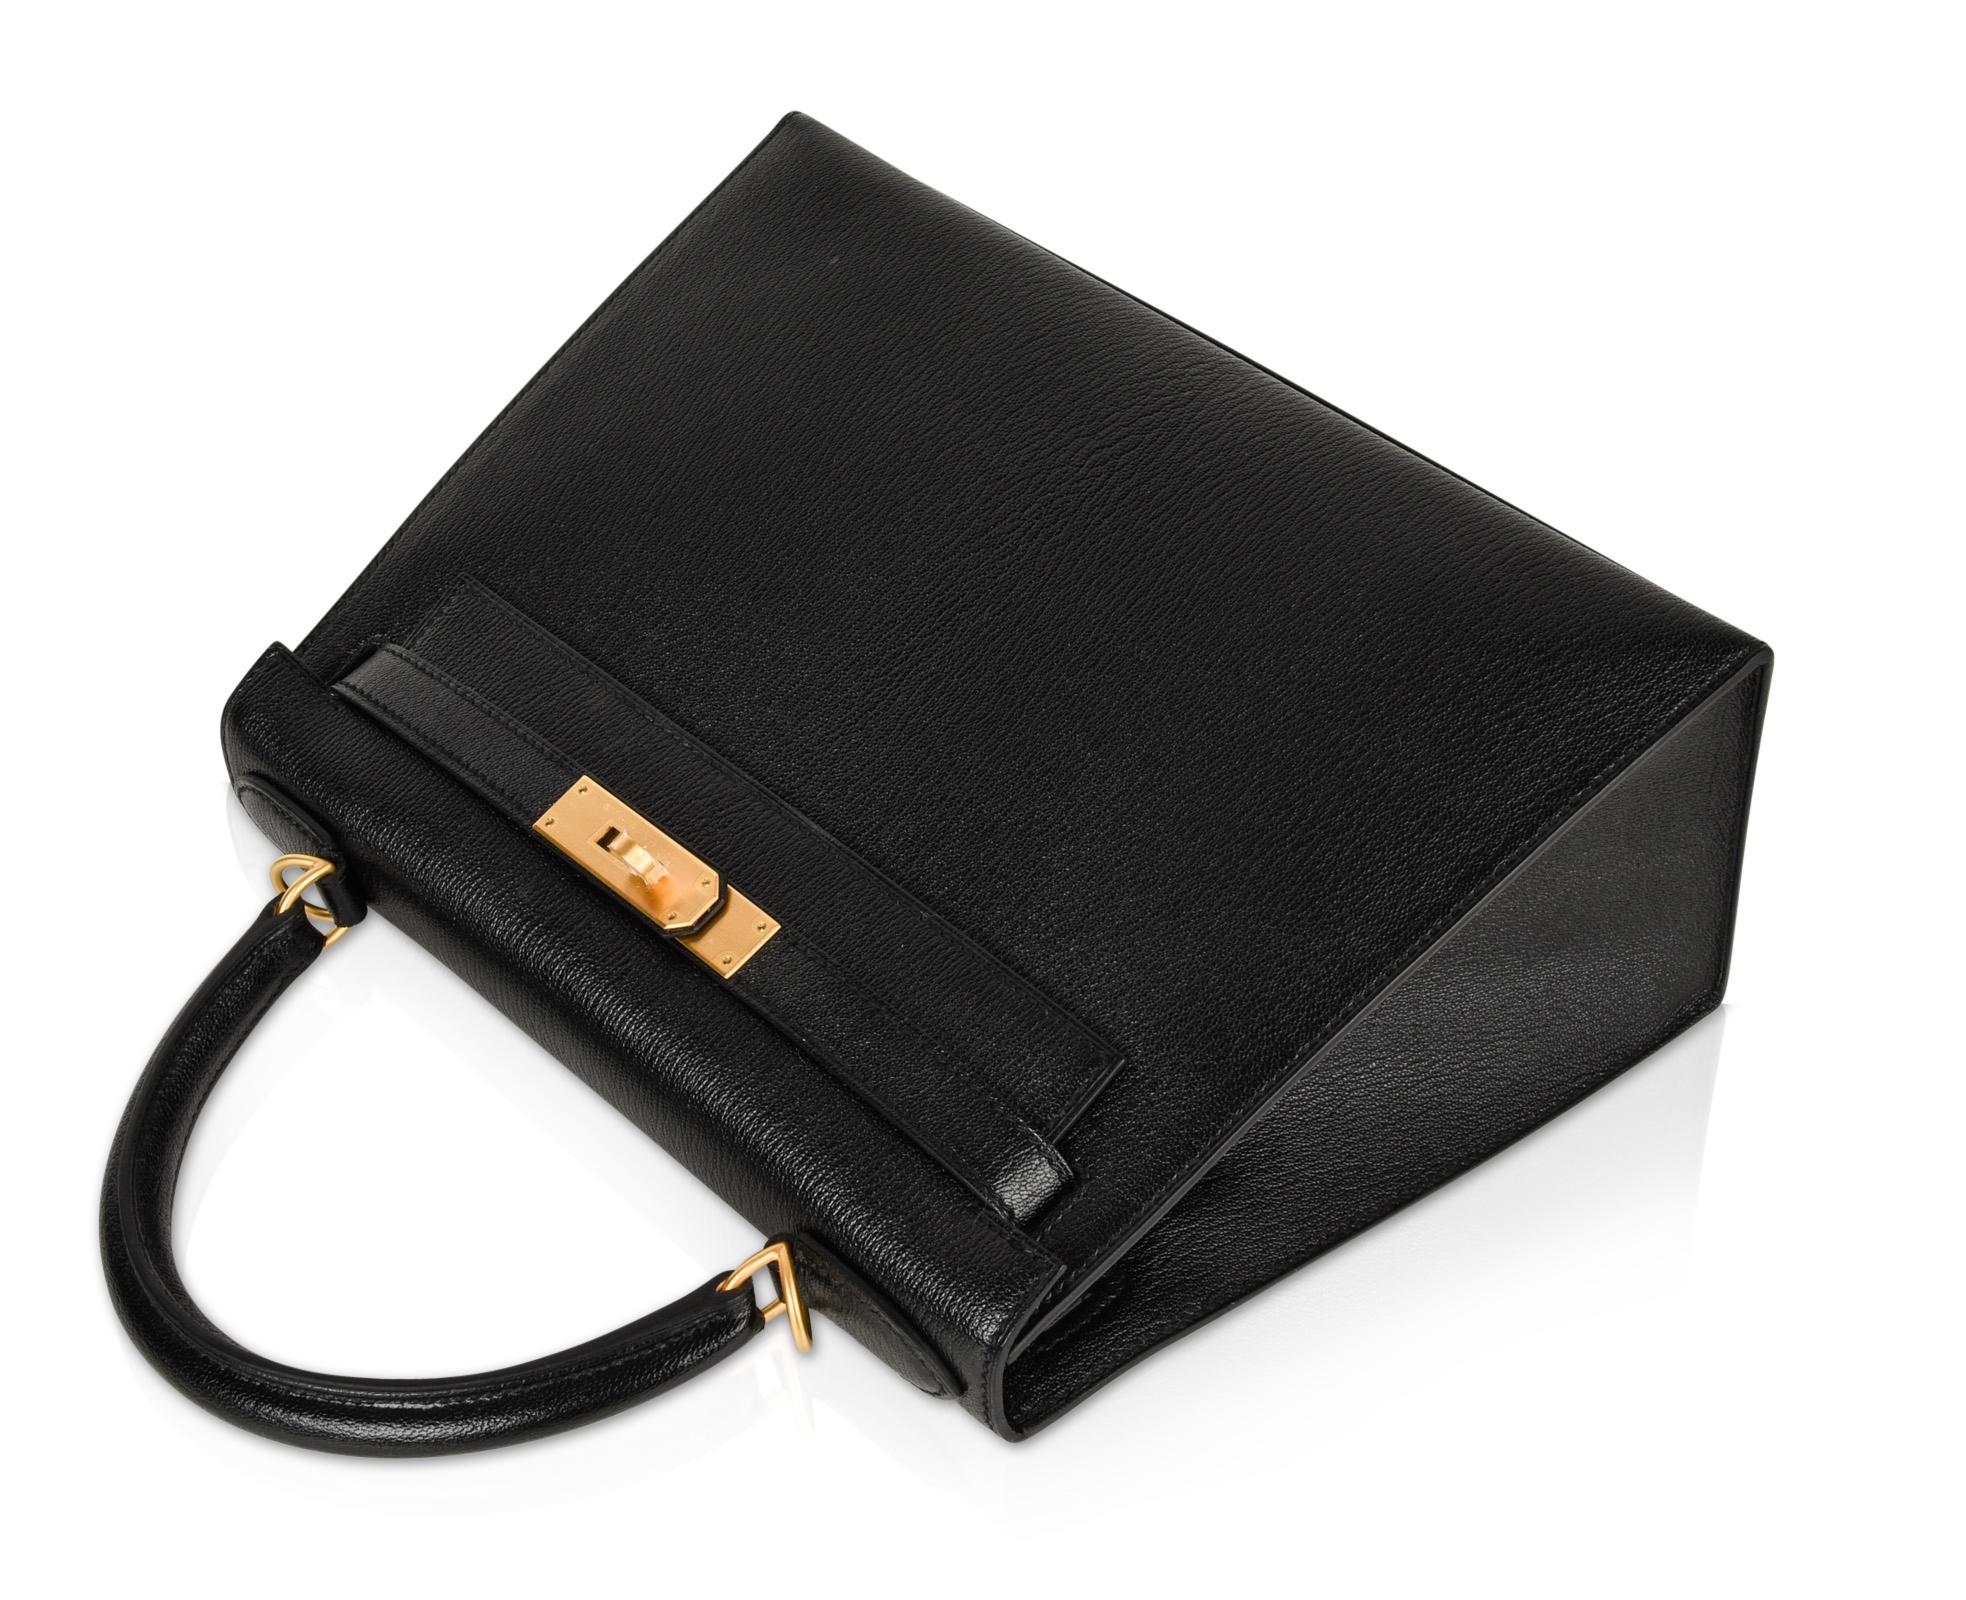 cad57981eb1e ... best price hermes kelly 28 bag hss sellier black chevre vermillion  interior brushed gold for sale